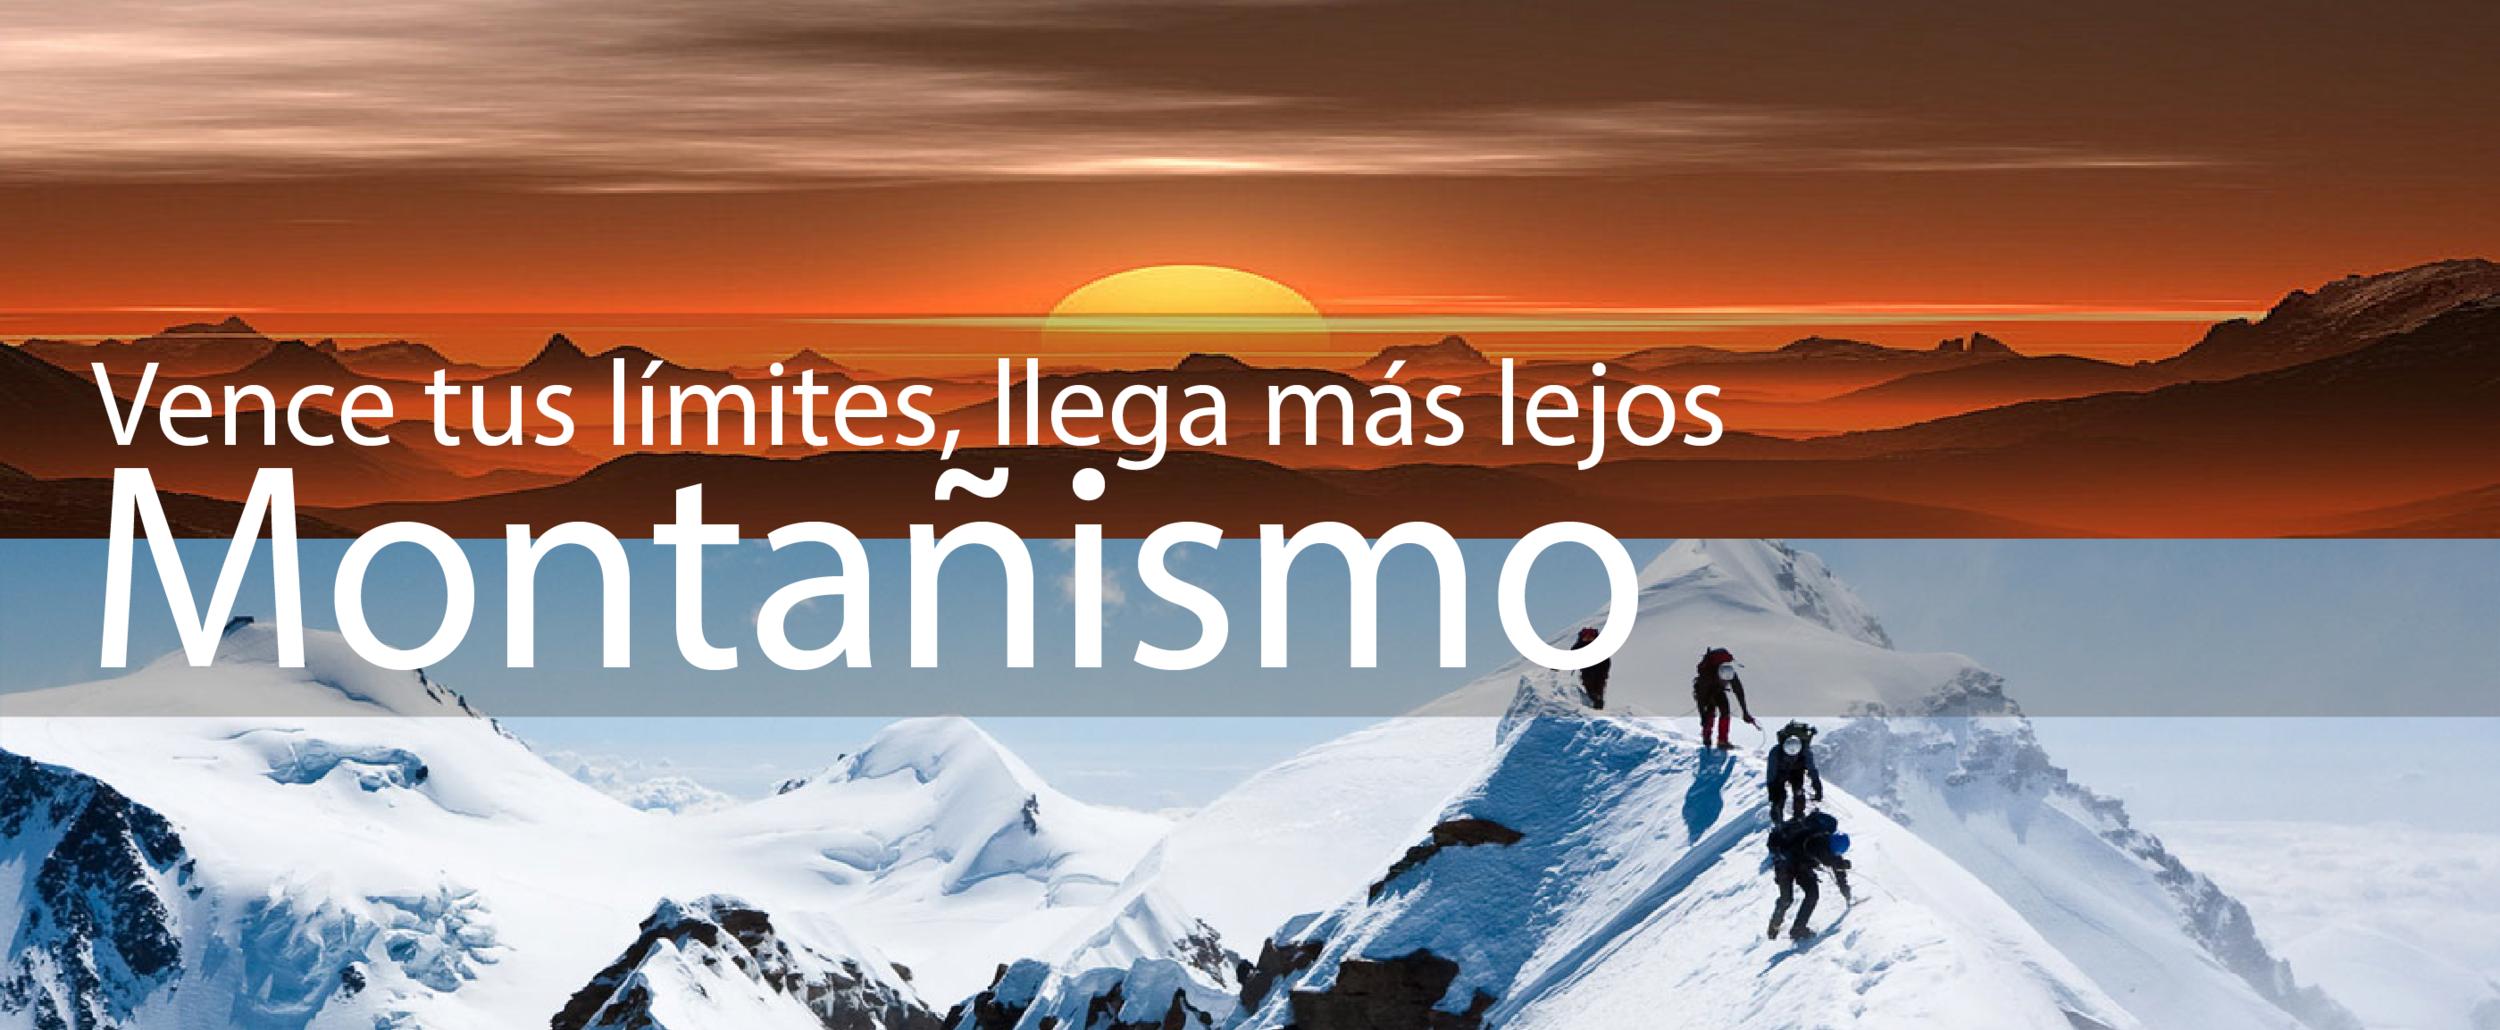 Montañismobann-02.png